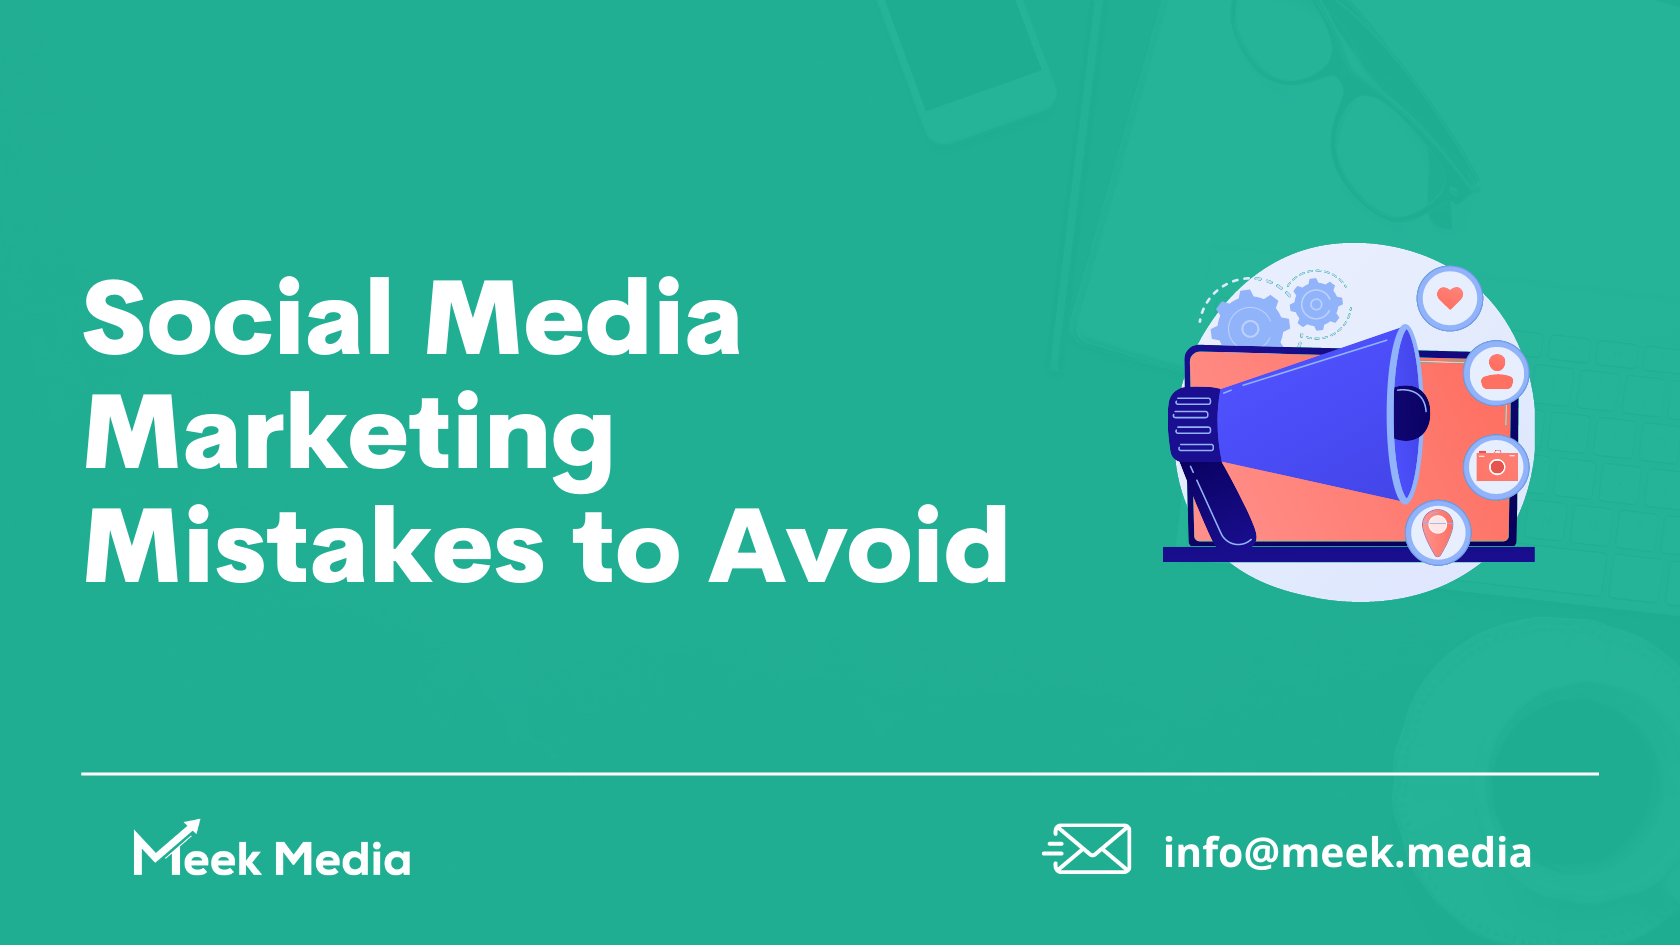 8 Social Media Marketing Mistakes to Avoid in 2021